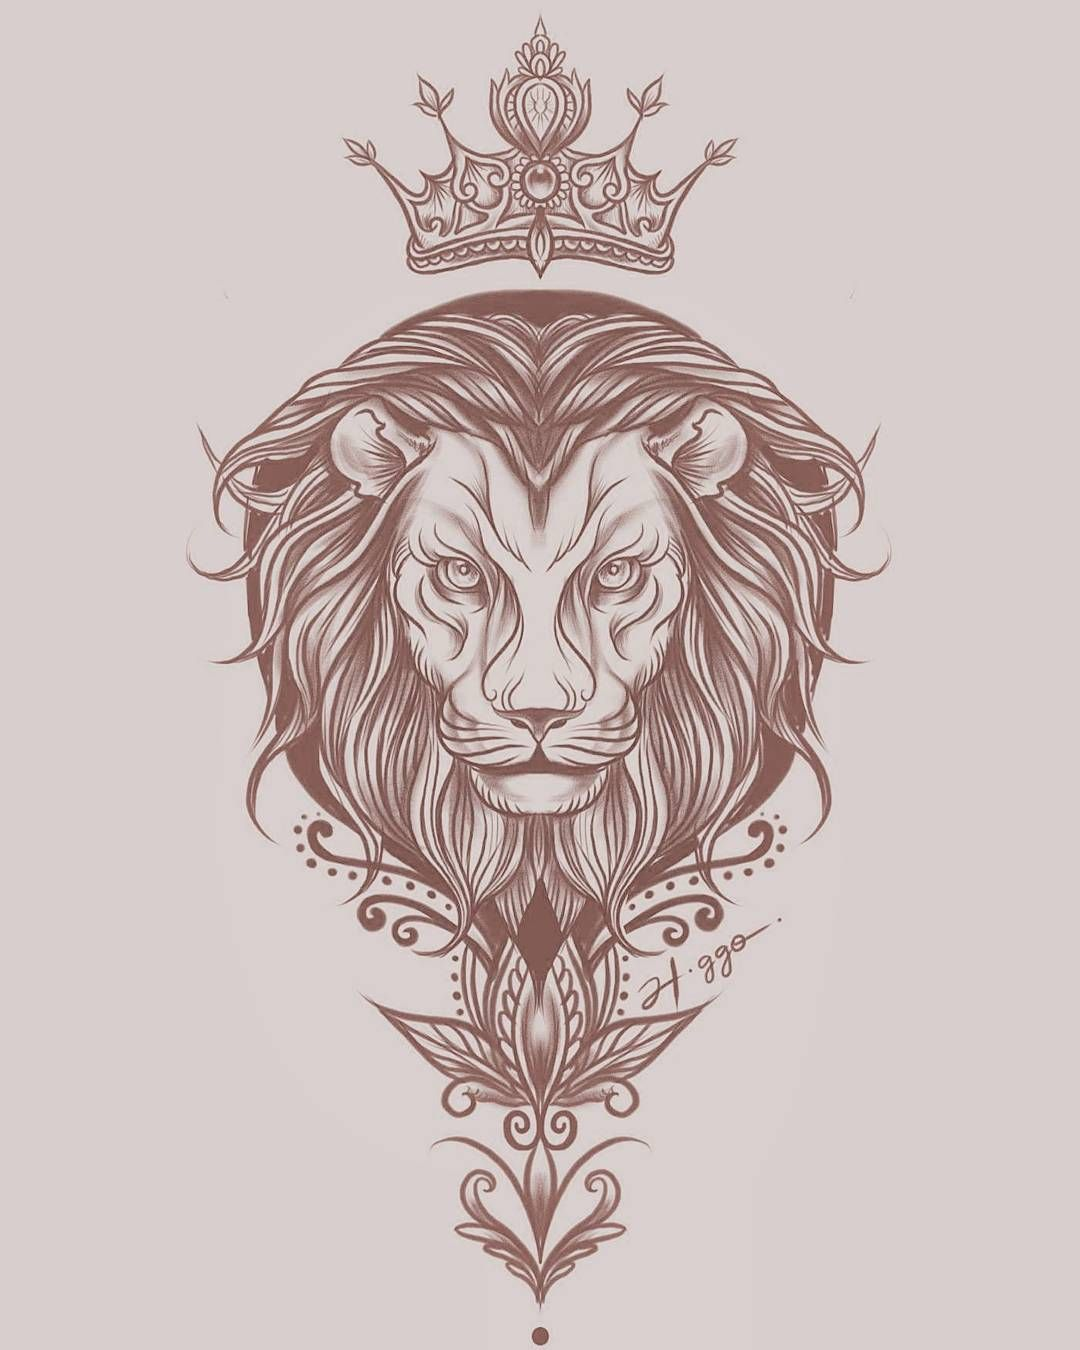 The Lion King Art Tattoo Sketch Ink Liontattoo Desenhando